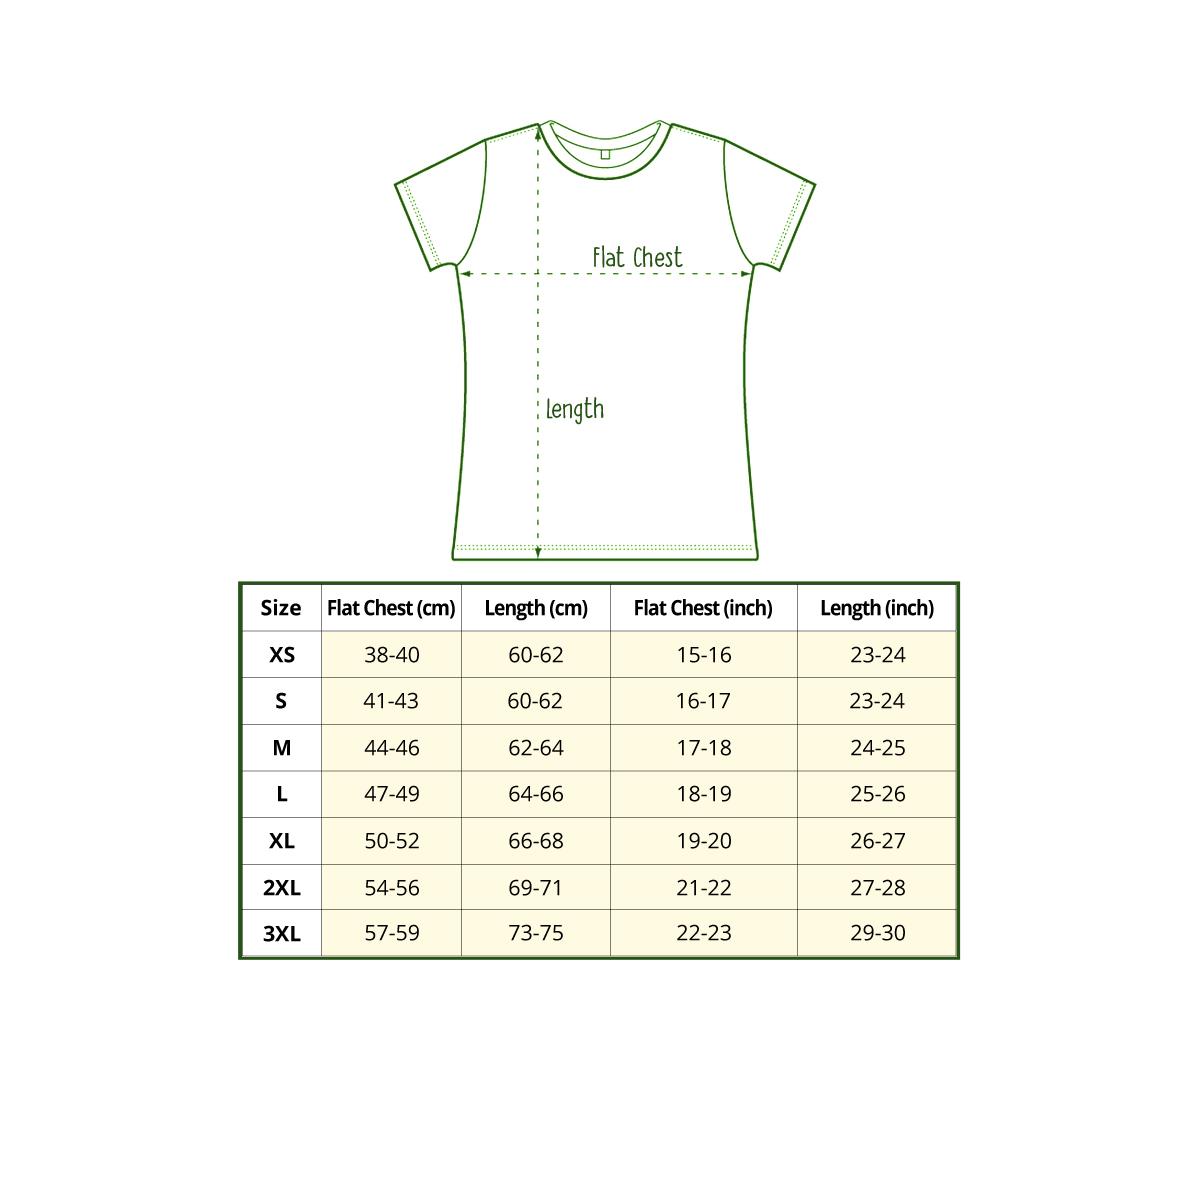 Pitbull Perro Animales Mujeres Camiseta XS-3XL Nuevo